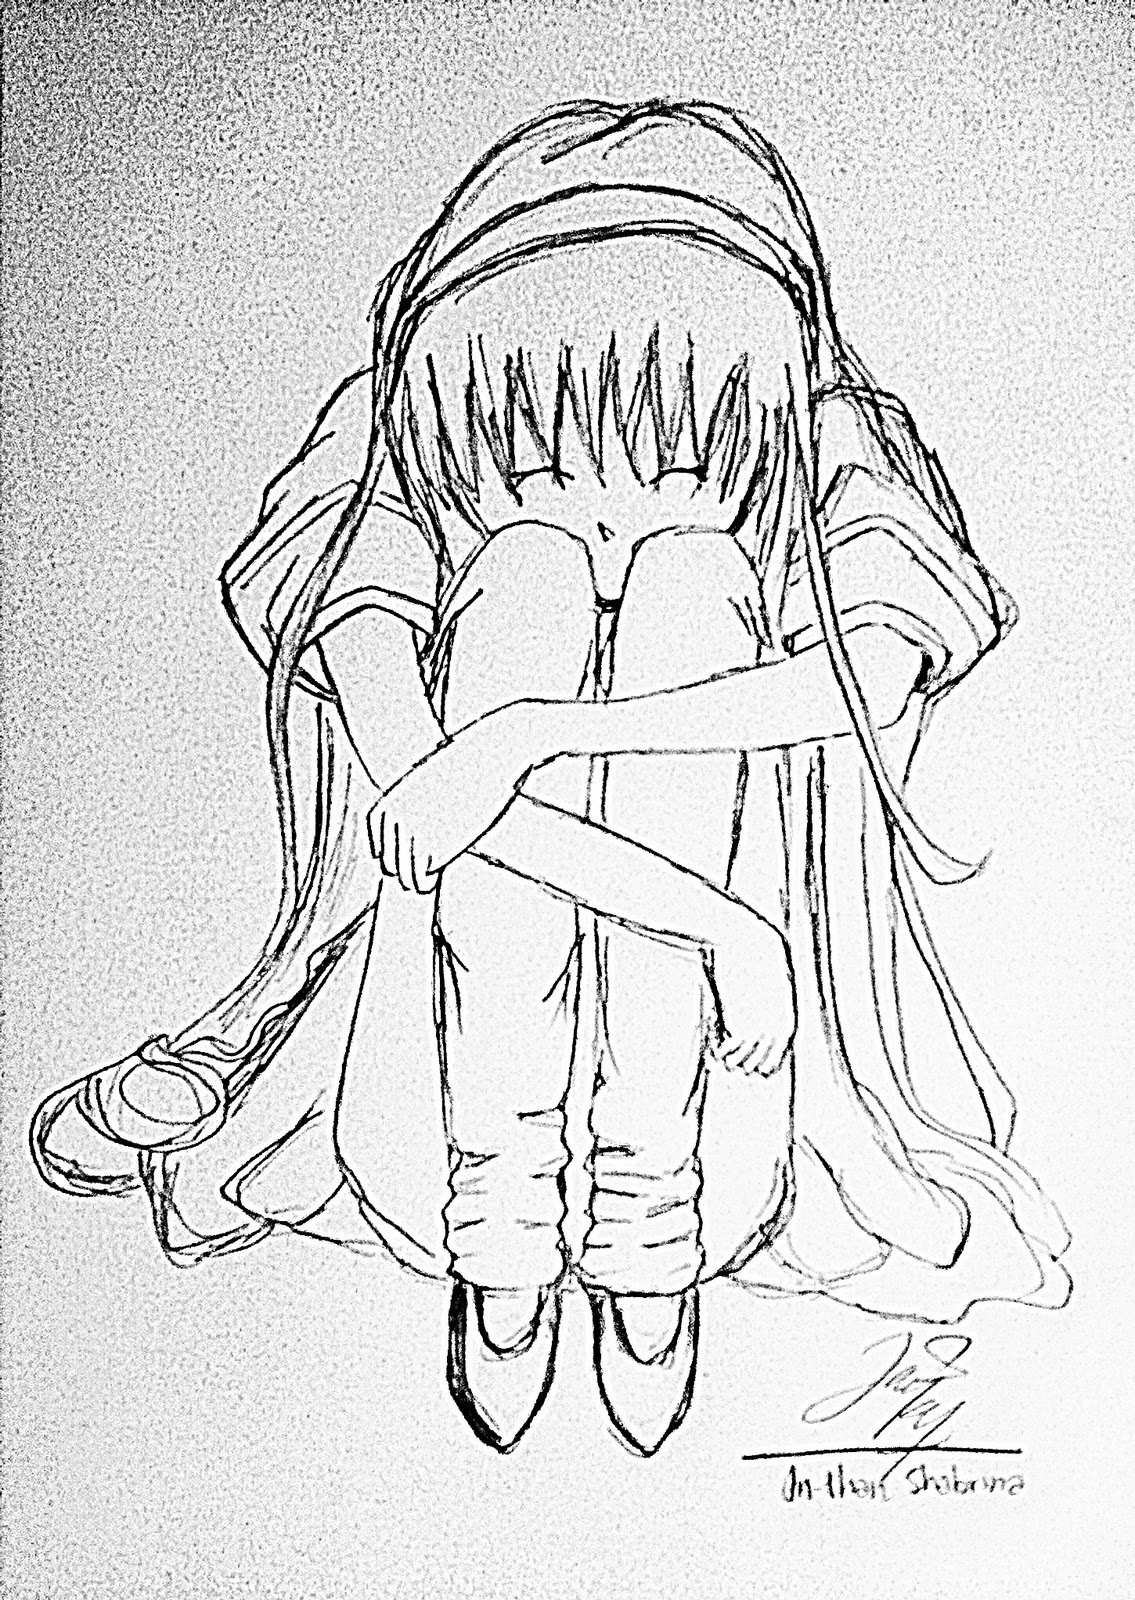 Gambar sketsa anime sedih